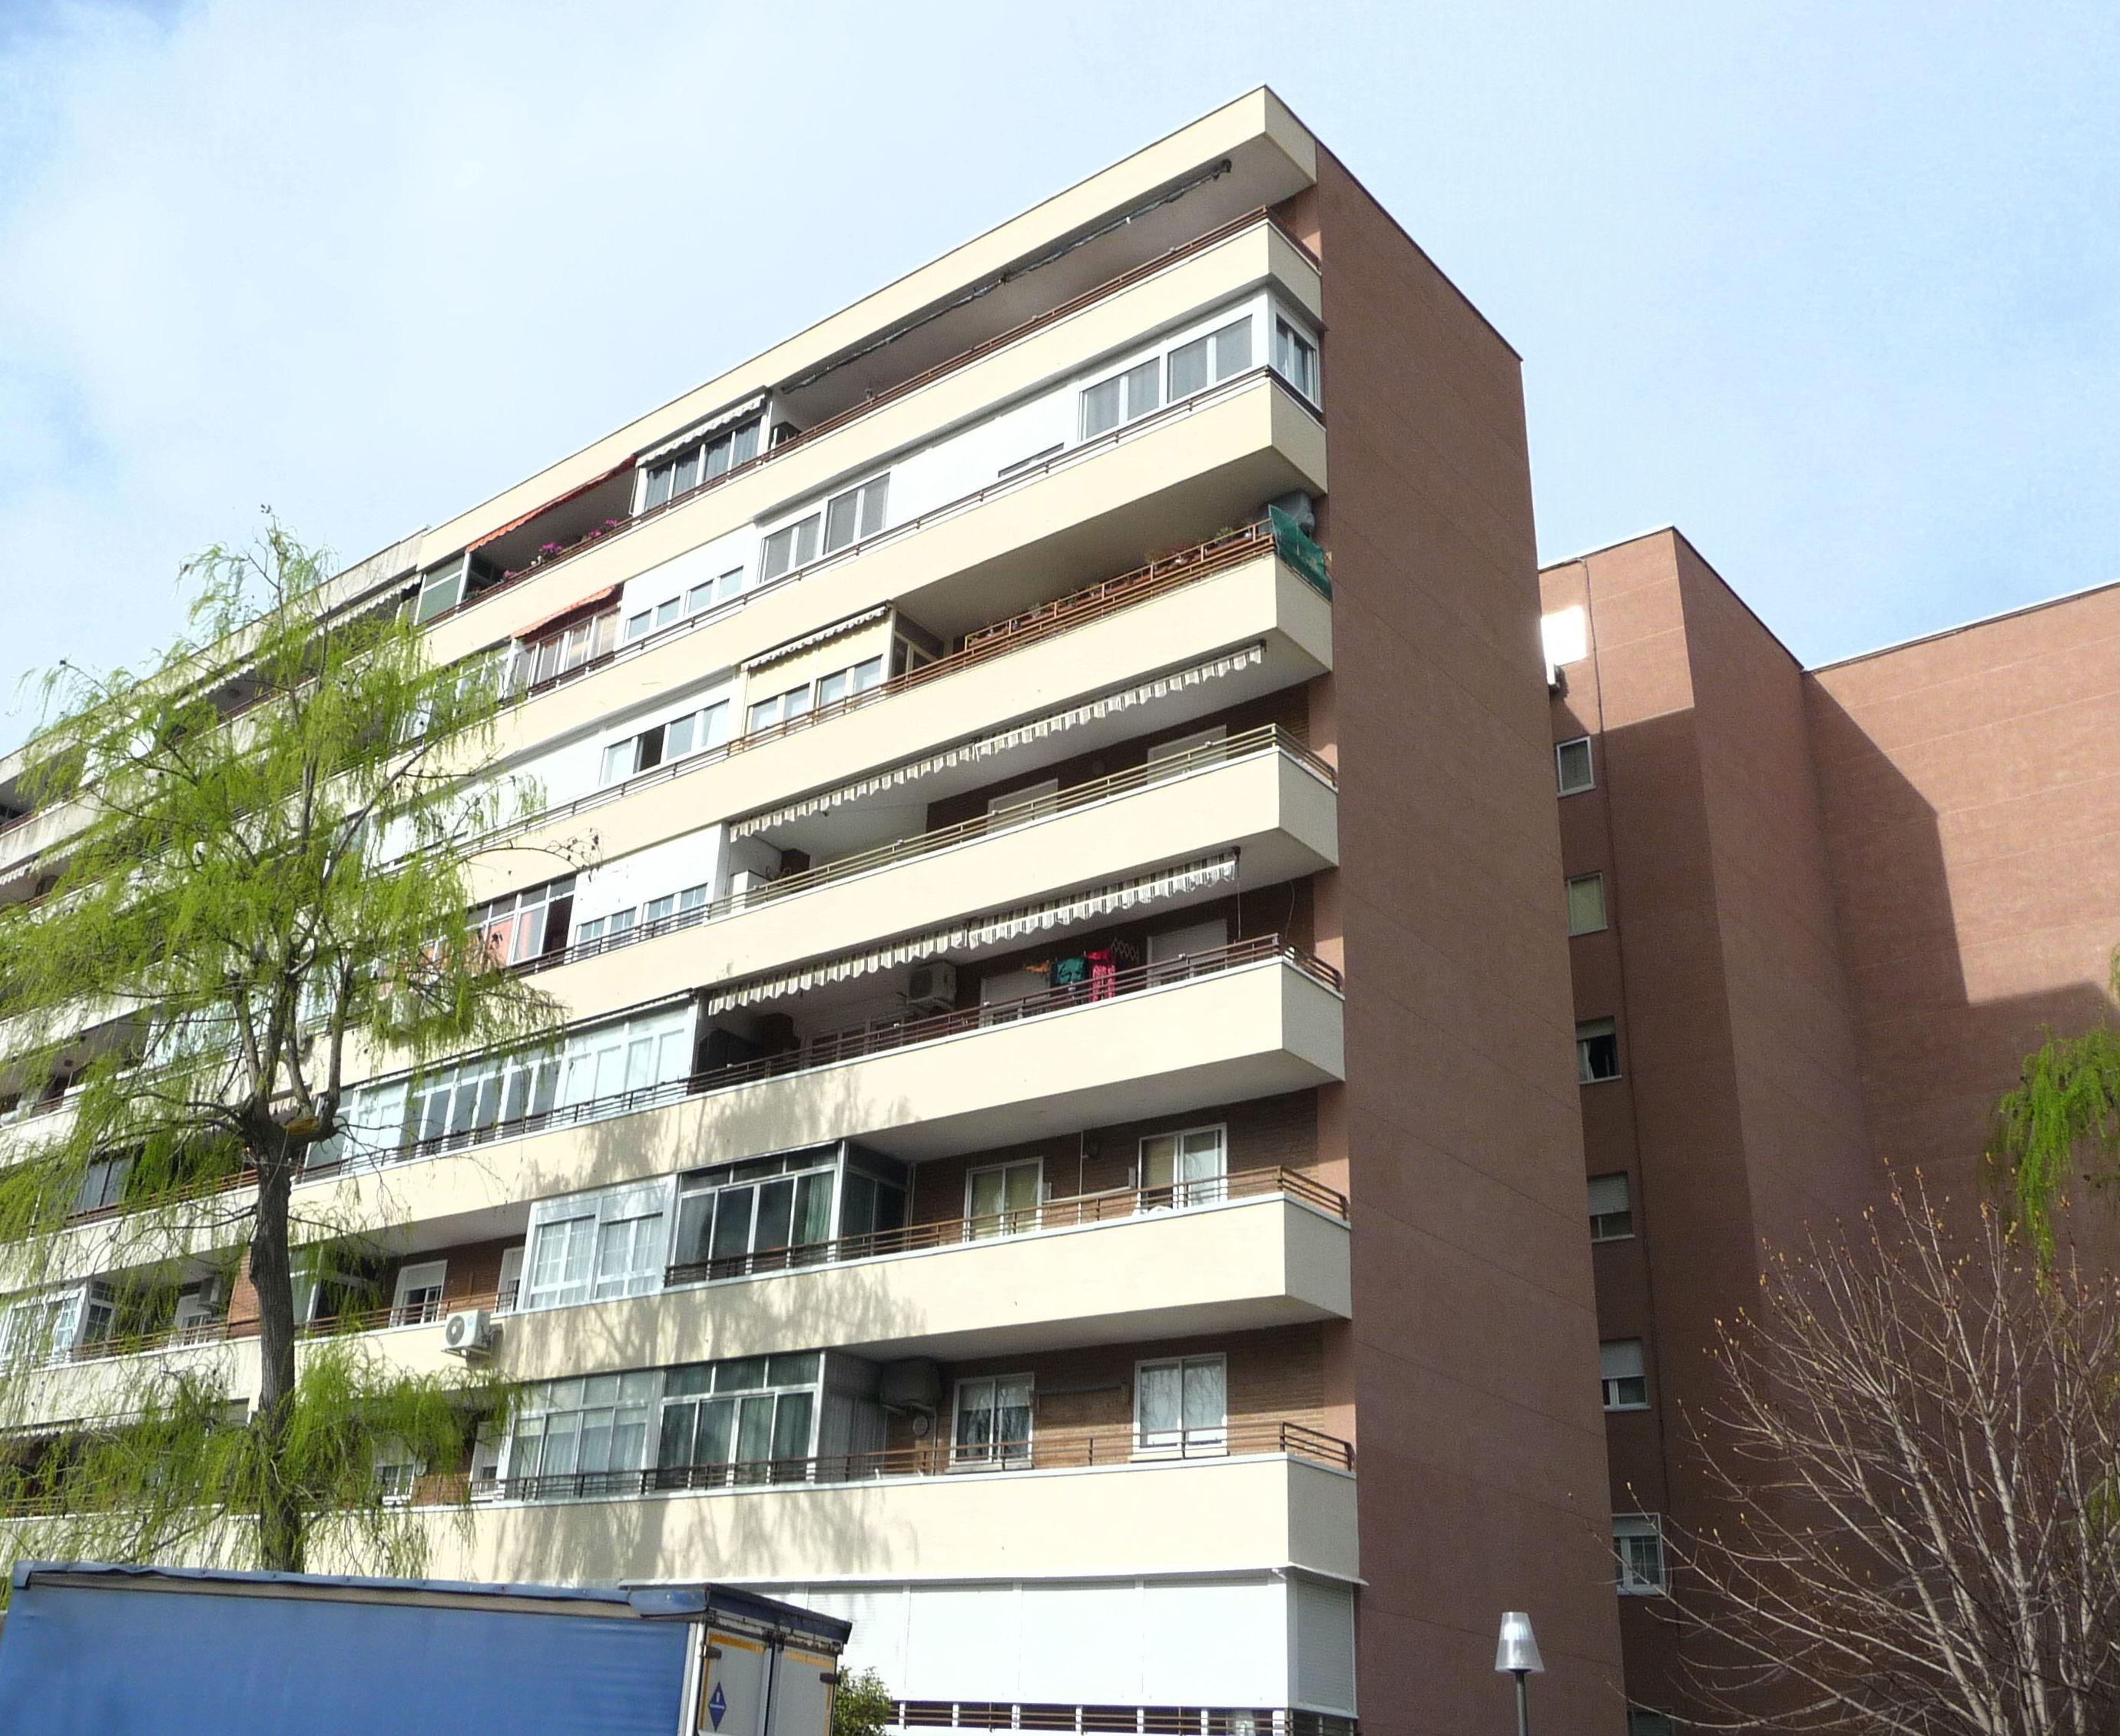 Foto 2 de Rehabilitación de edificios en Madrid | Elax Rehabilitación